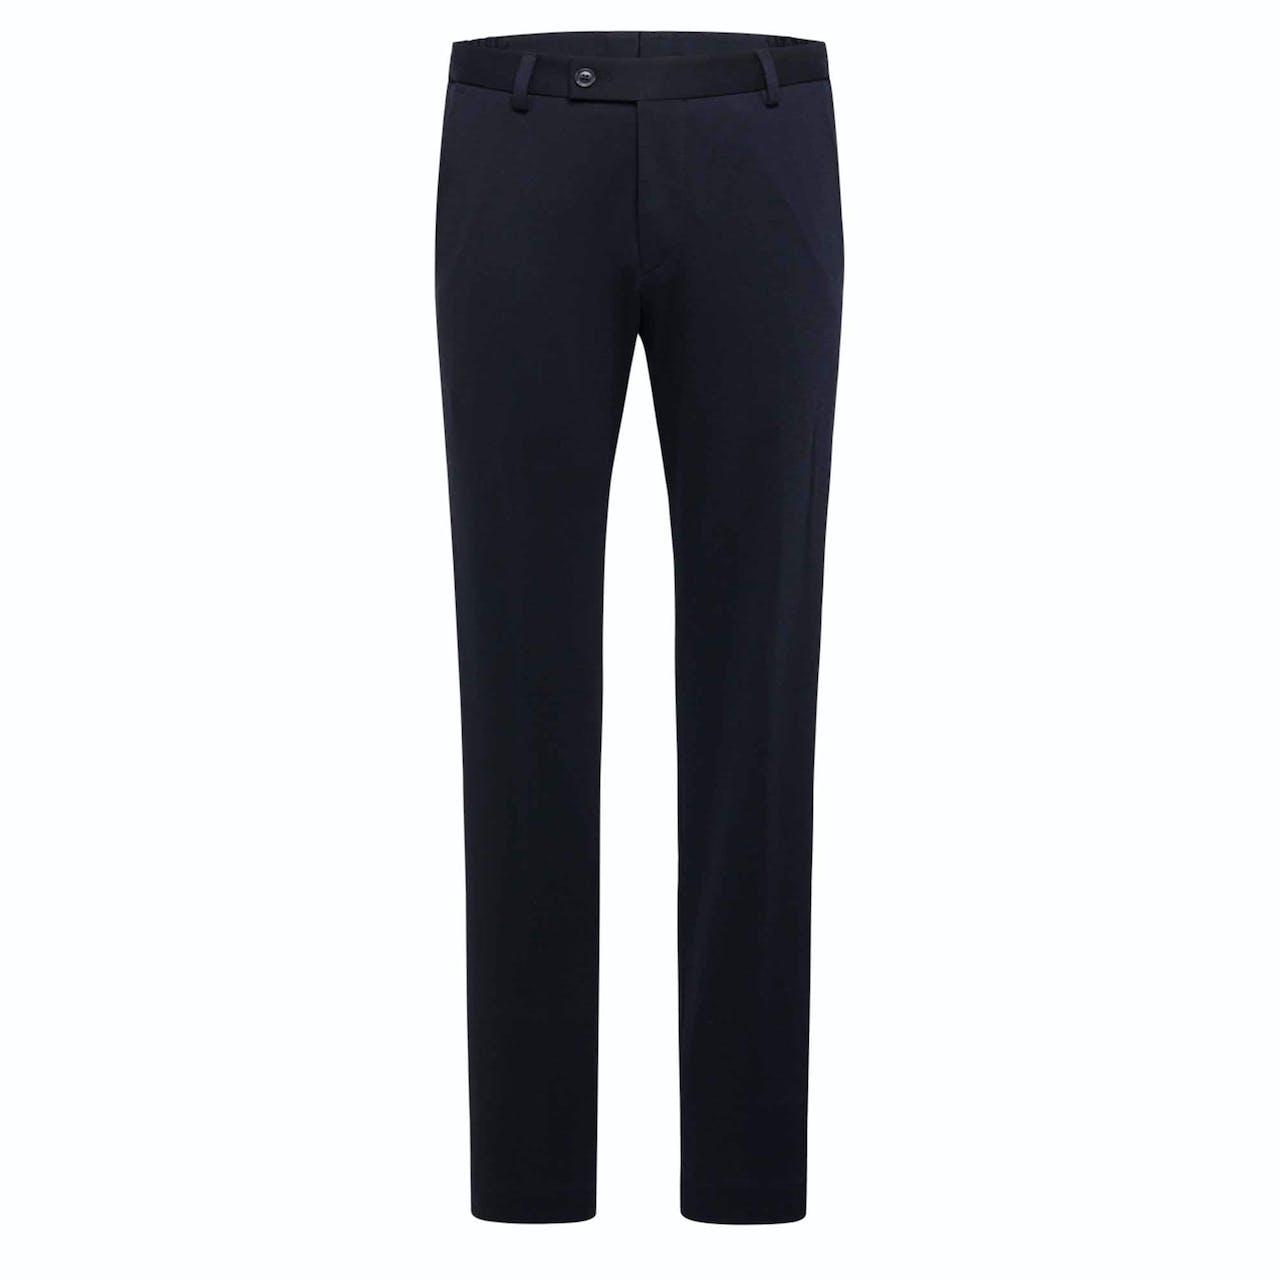 Jerseyhose - Modern Fit - unifarben